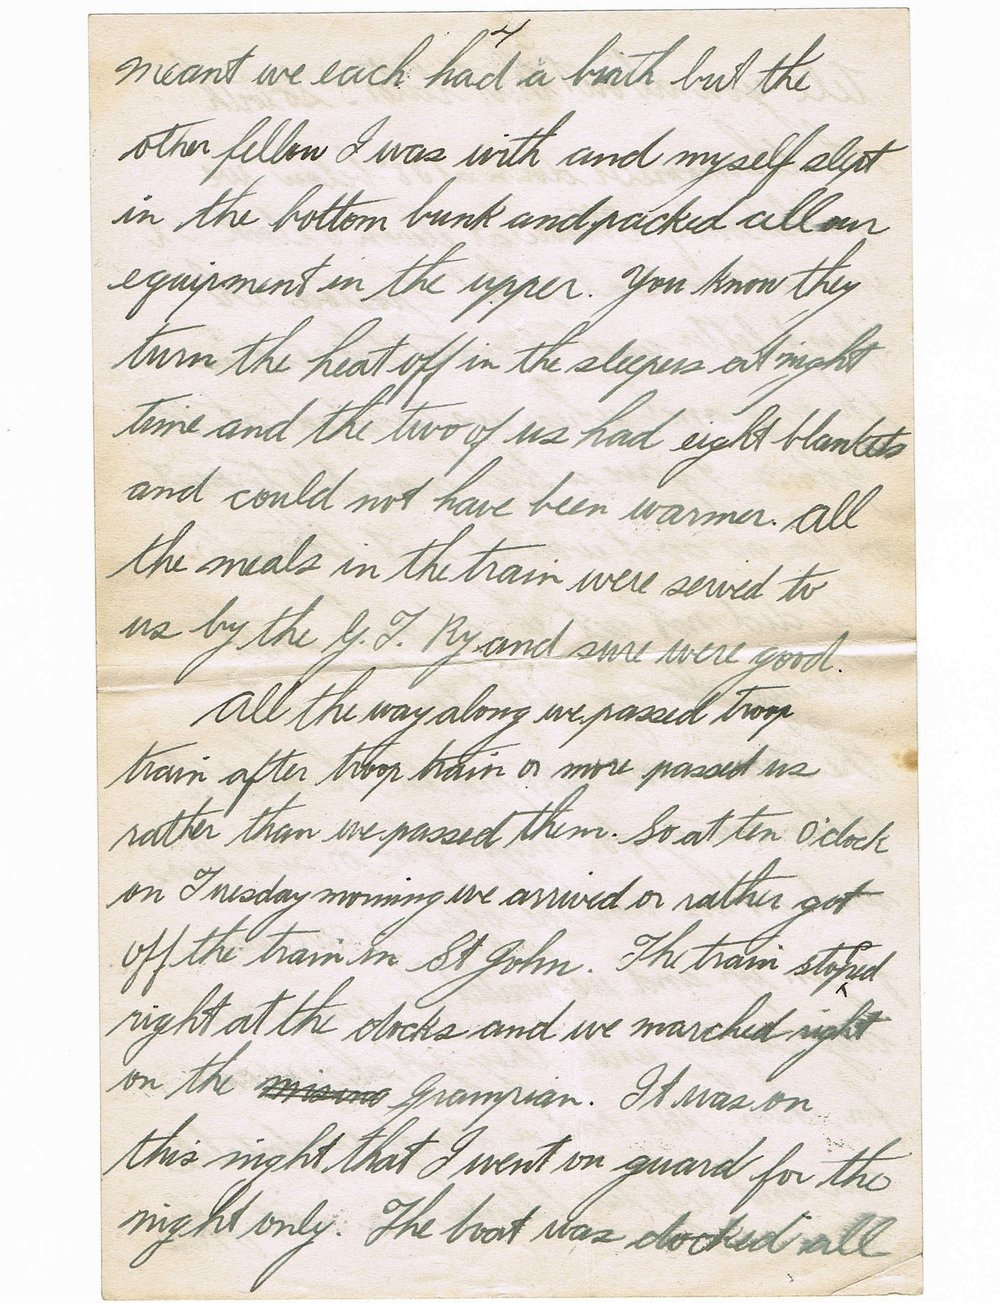 Basil Vale January 2, 1918 letter - page 4.jpg